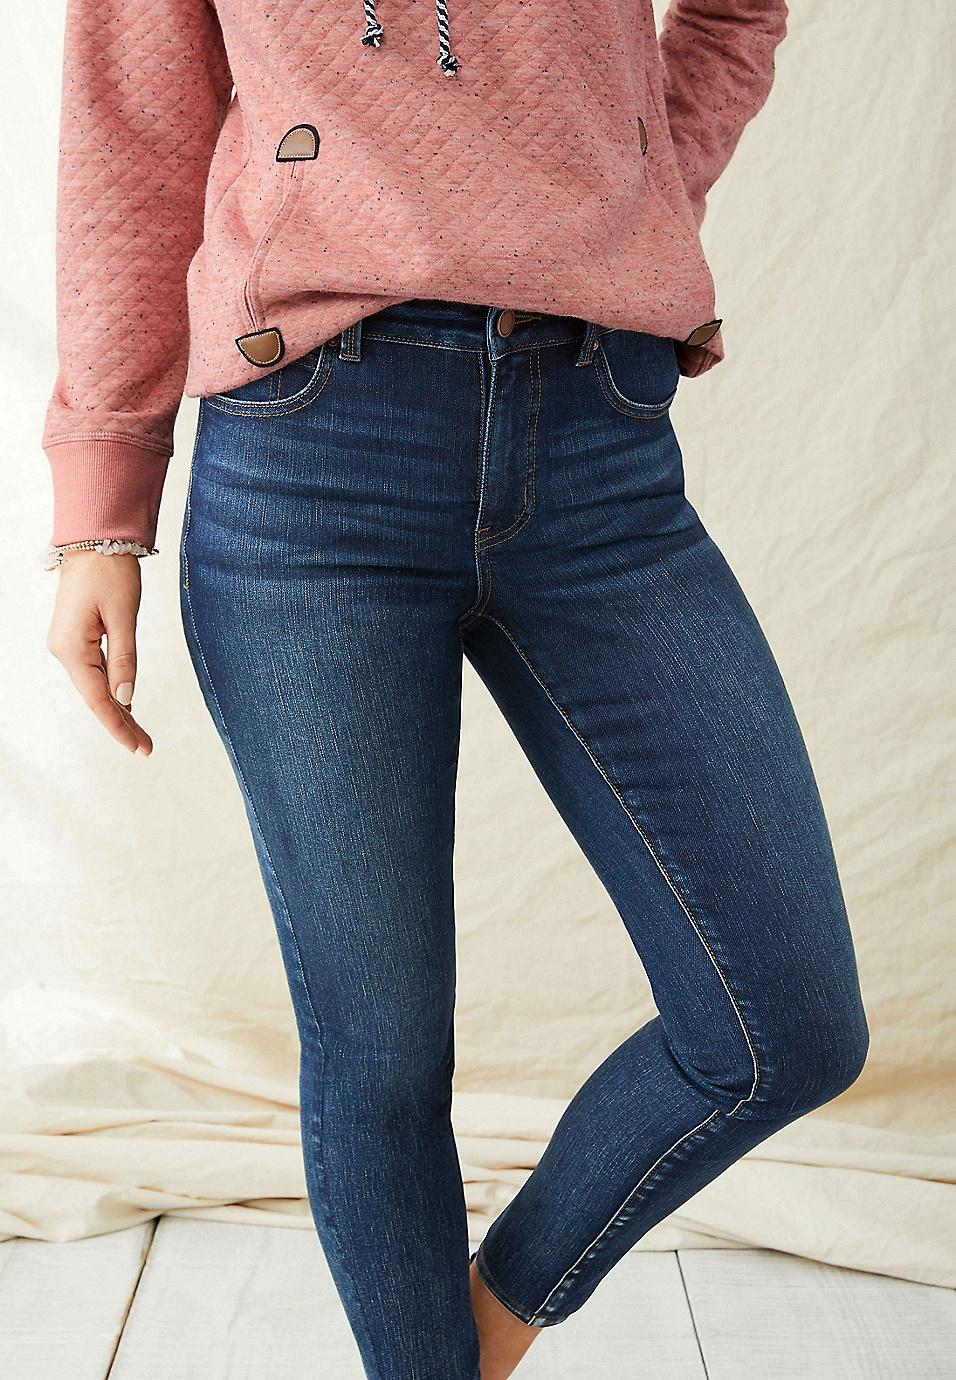 02767fb62 Everflex™ high rise dark tint stretch skinny jean   maurices